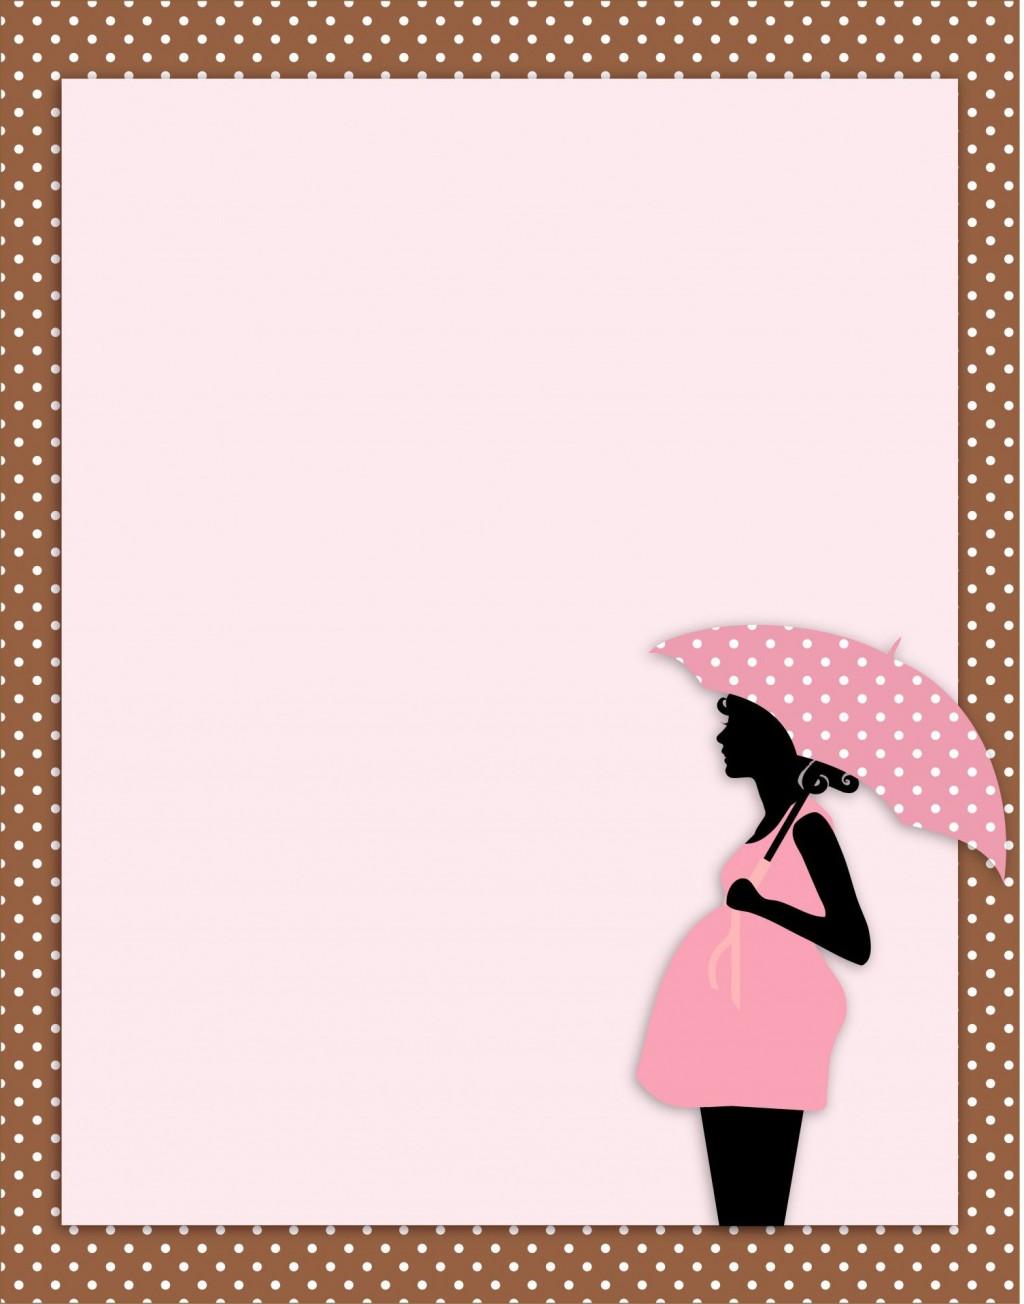 006 Surprising Baby Shower Card Template Photo  Microsoft Word Invitation Design Online Printable FreeLarge